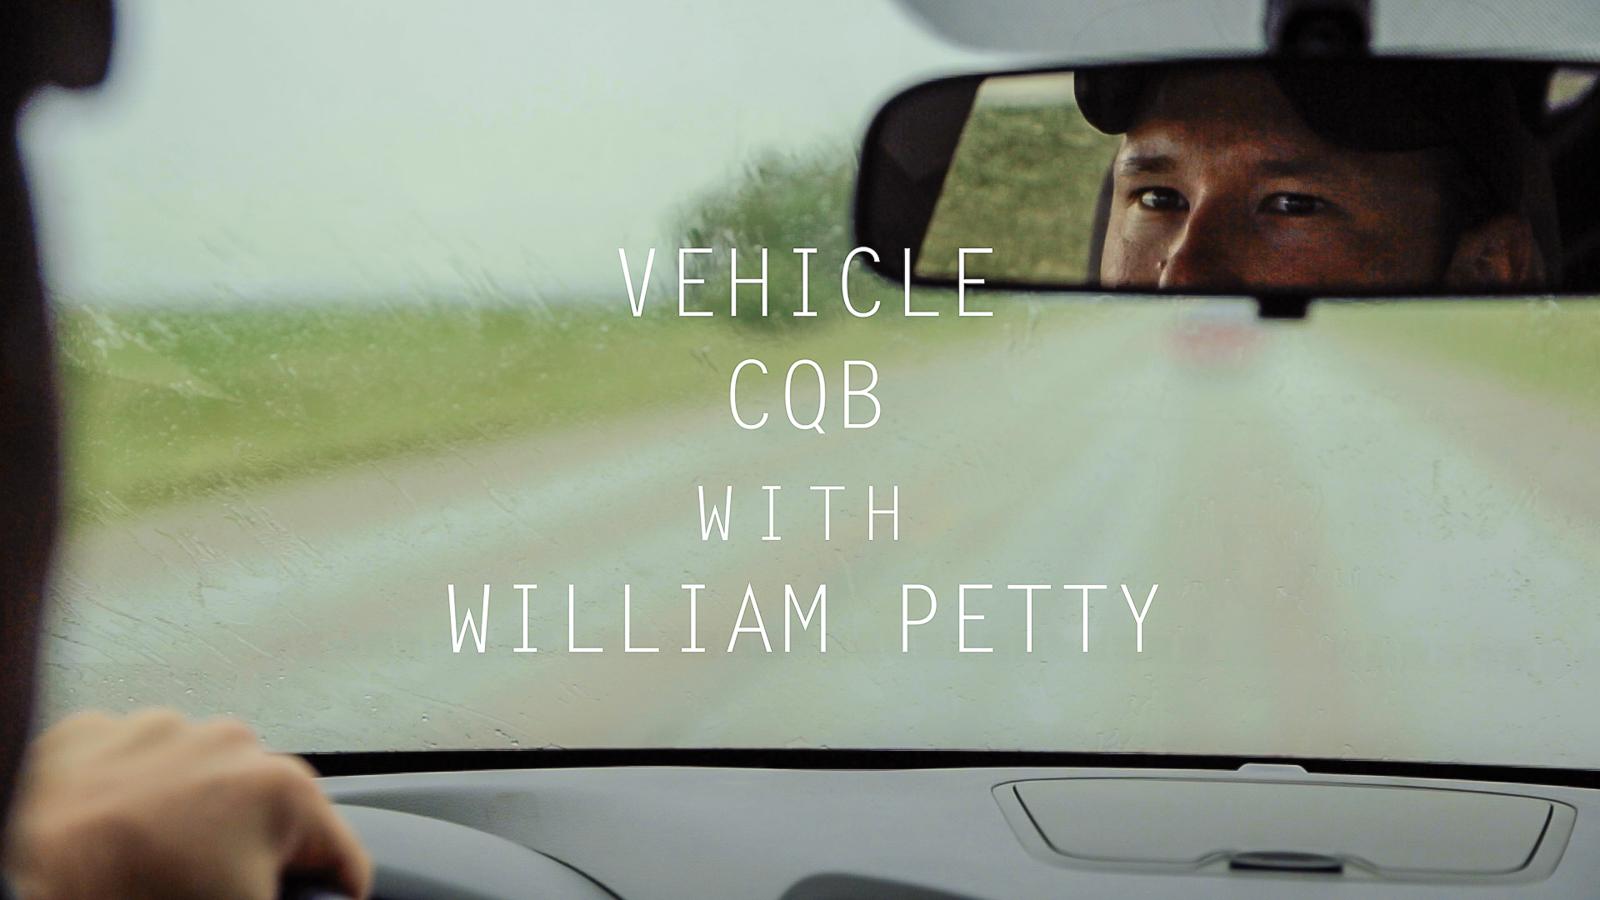 Firelance Media Vehicle CQB with William Petty